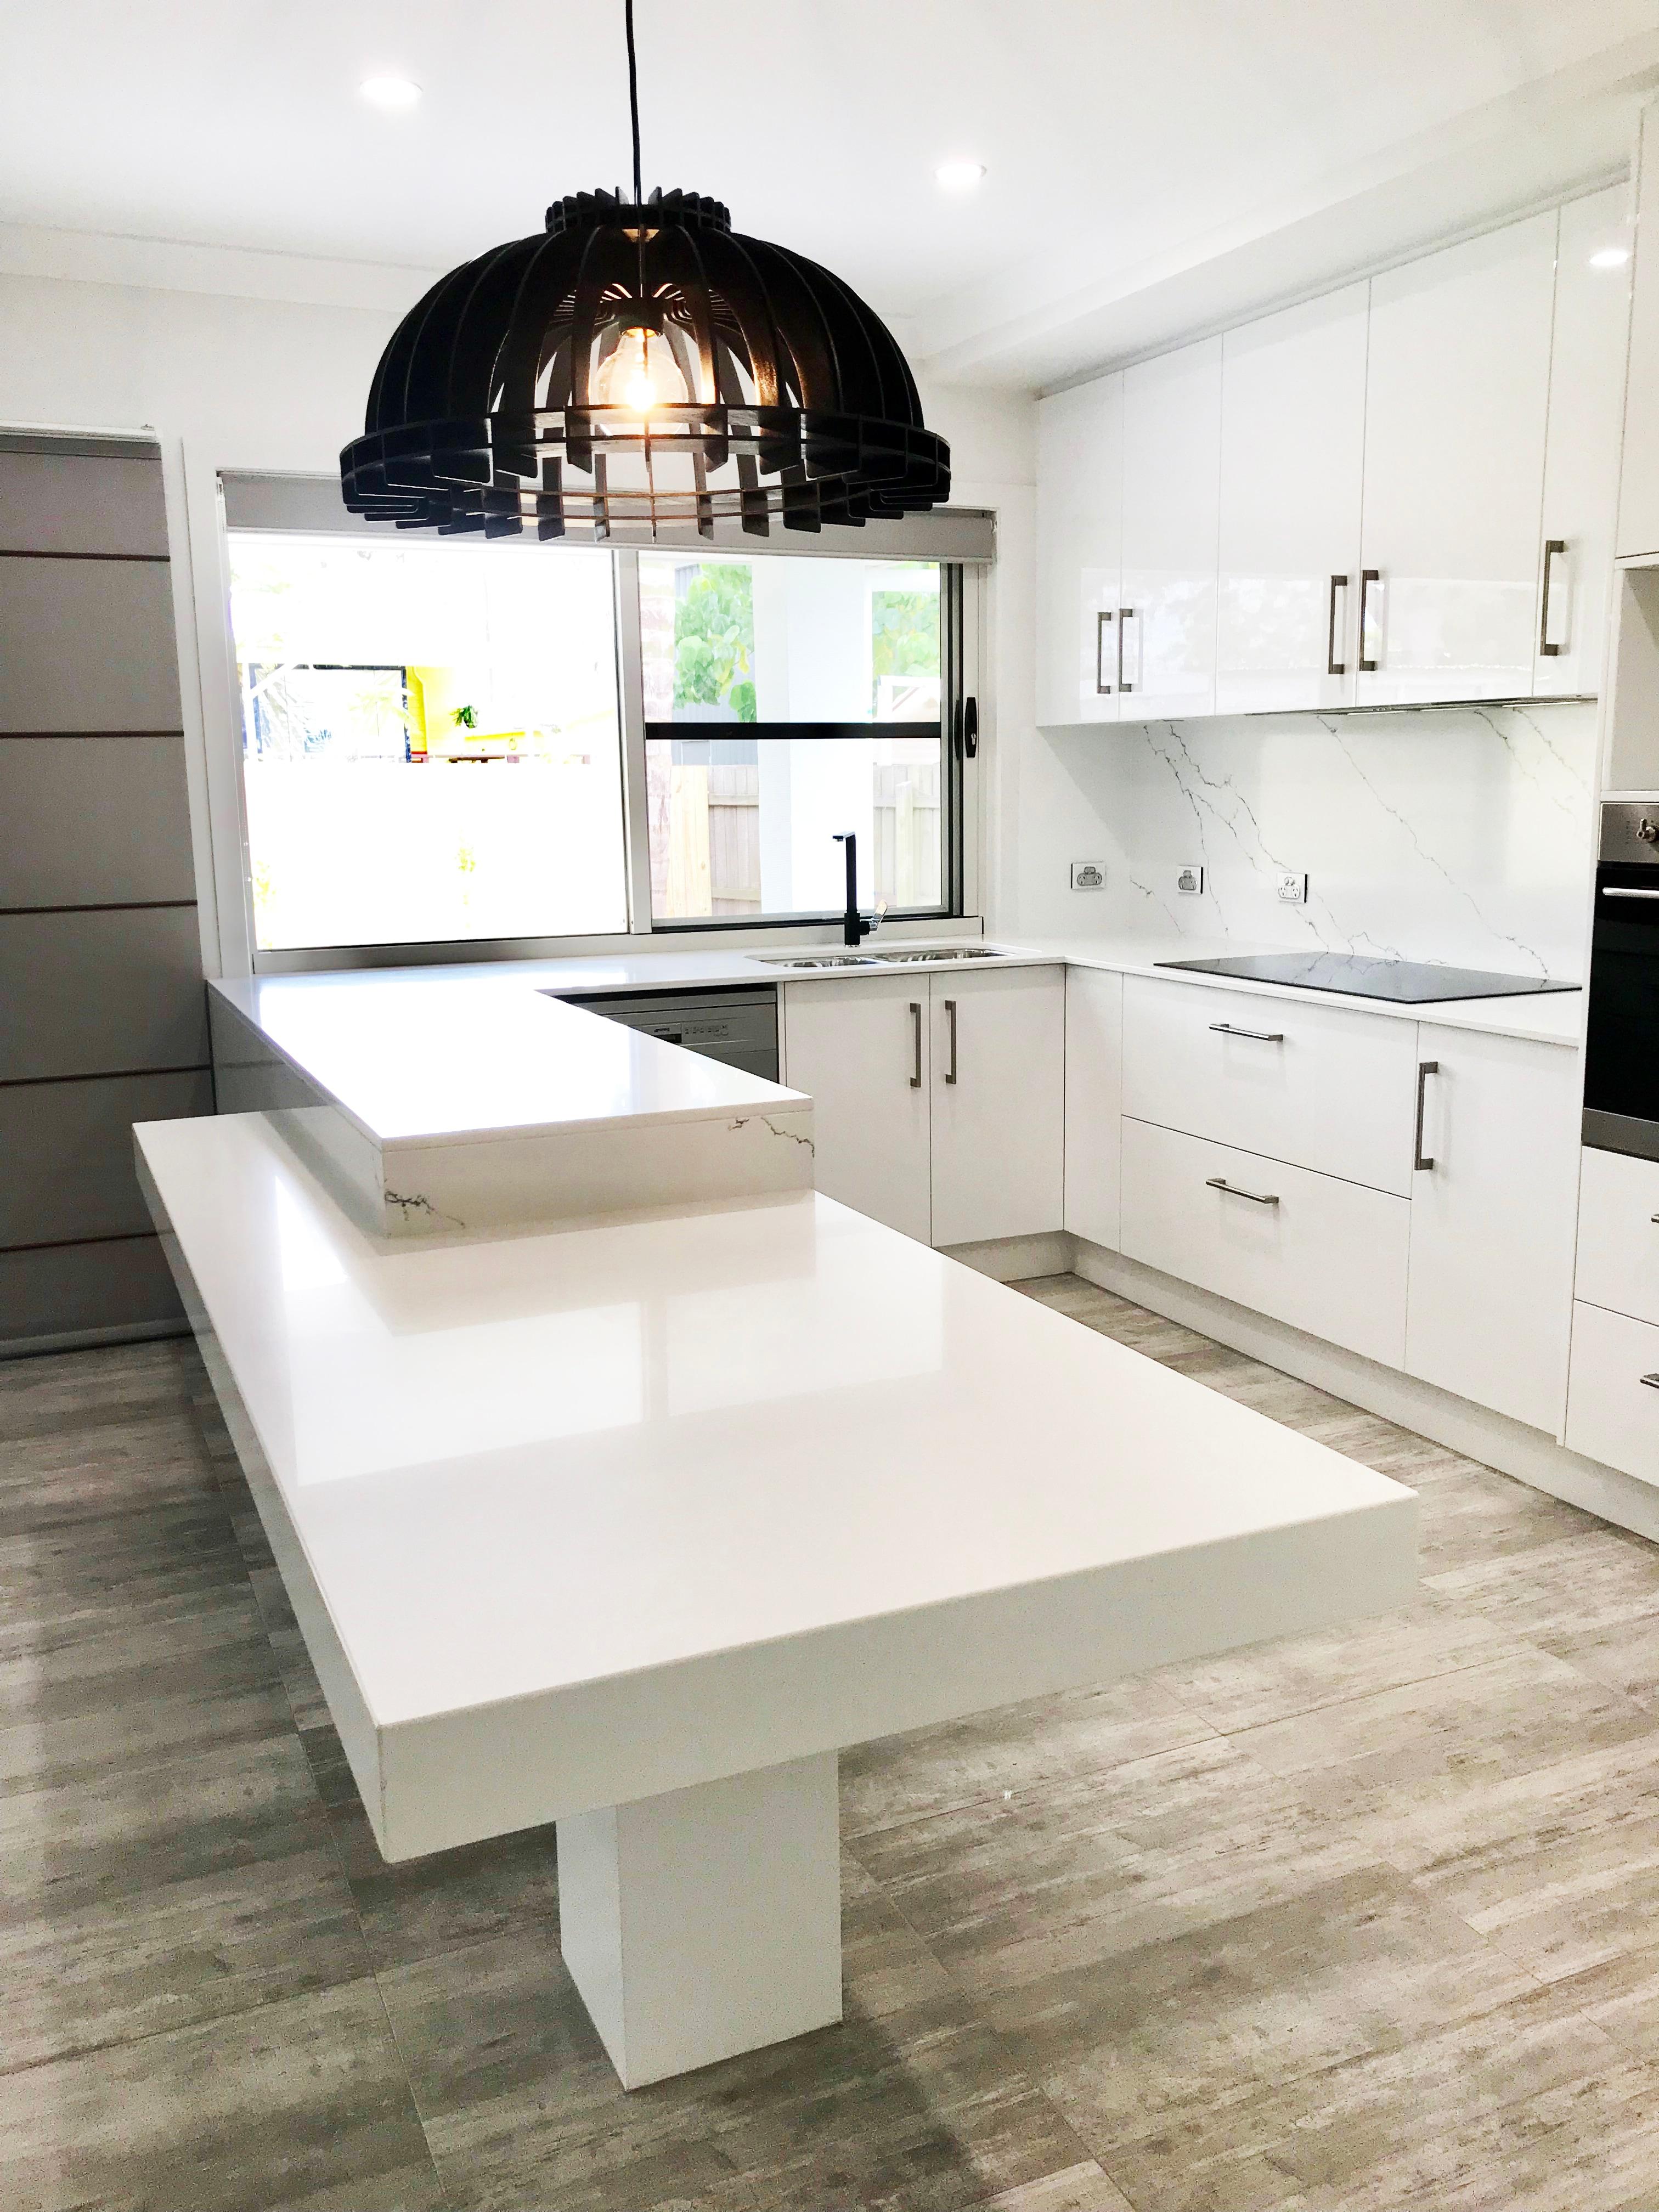 Hervey Bay Cabinet Craft - Kitchen Renovations & Designs - 61 Old ...